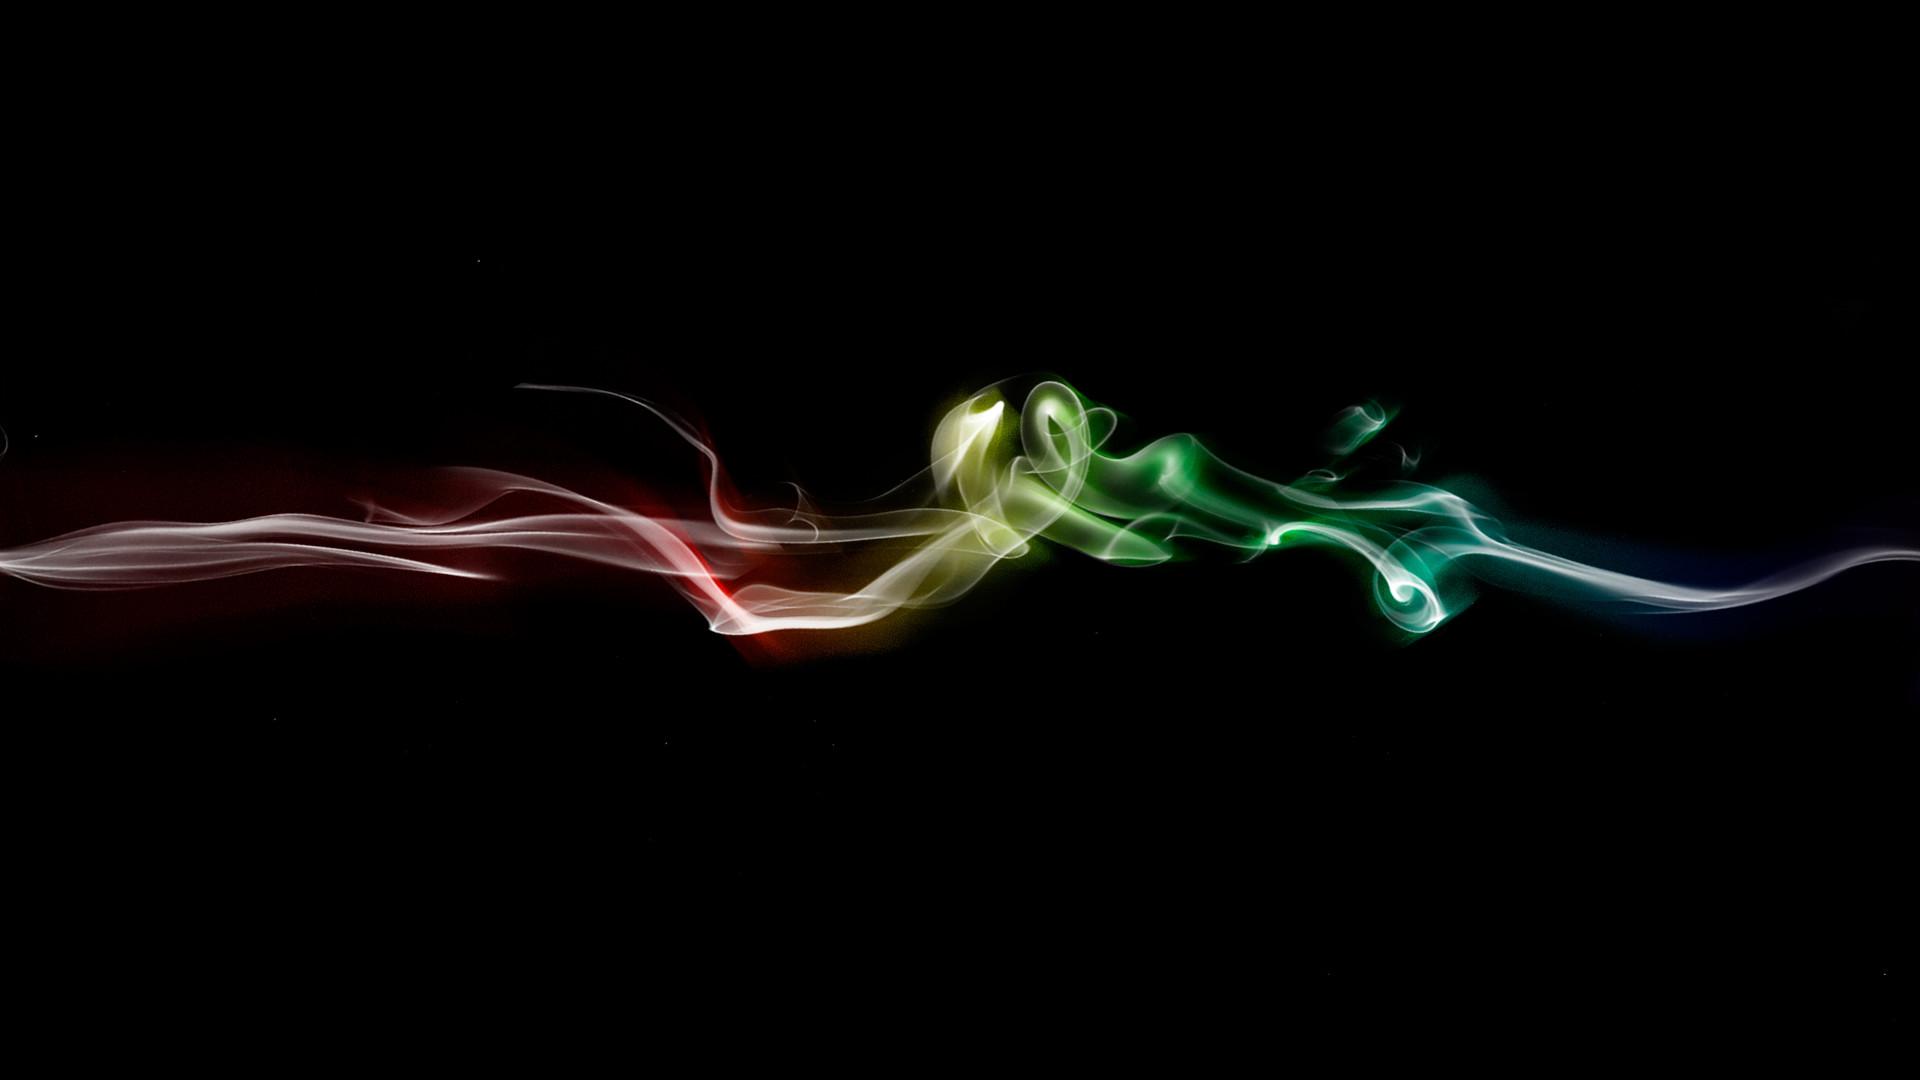 Animated Smoke Wallpaper